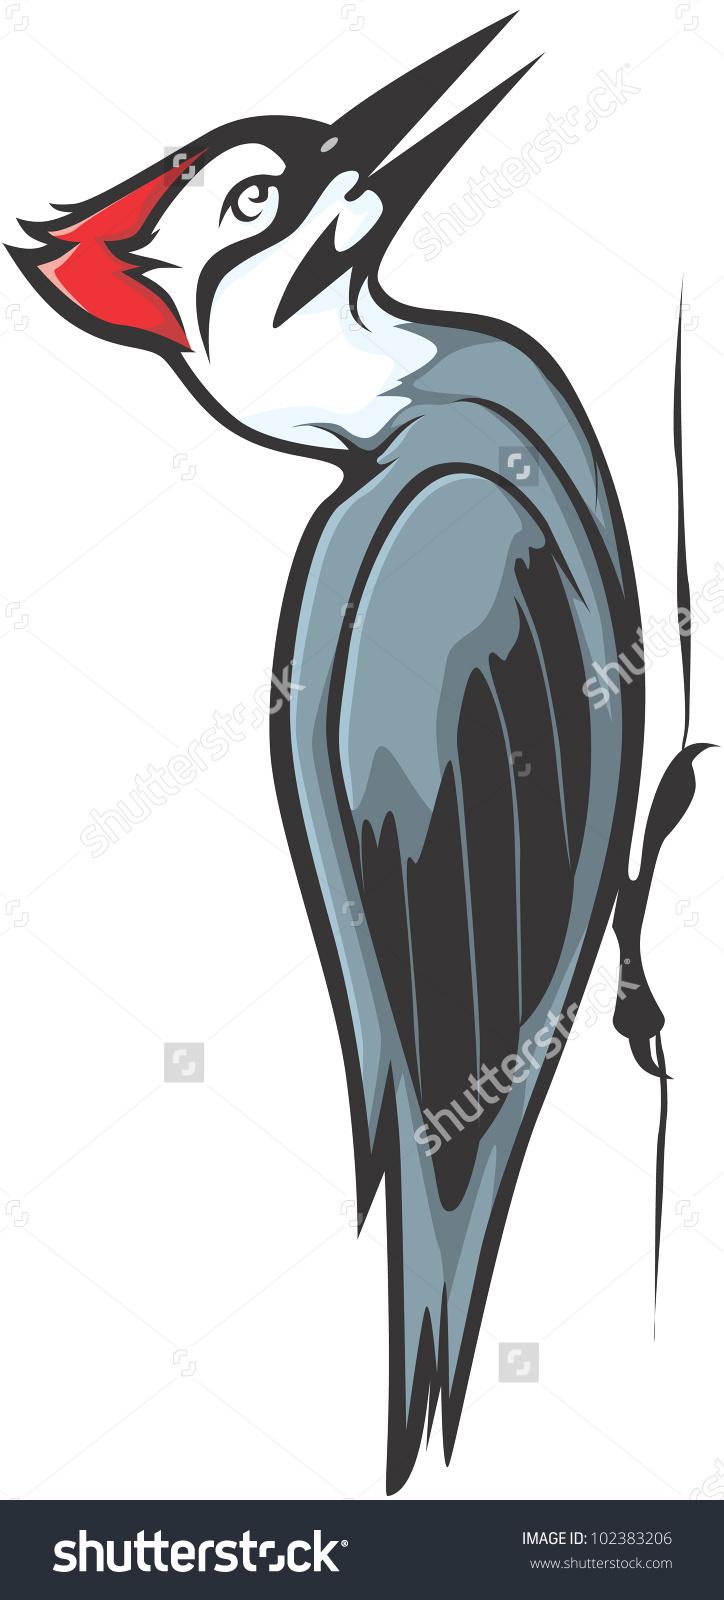 Creative Ivory Billed Woodpecker Illustration.